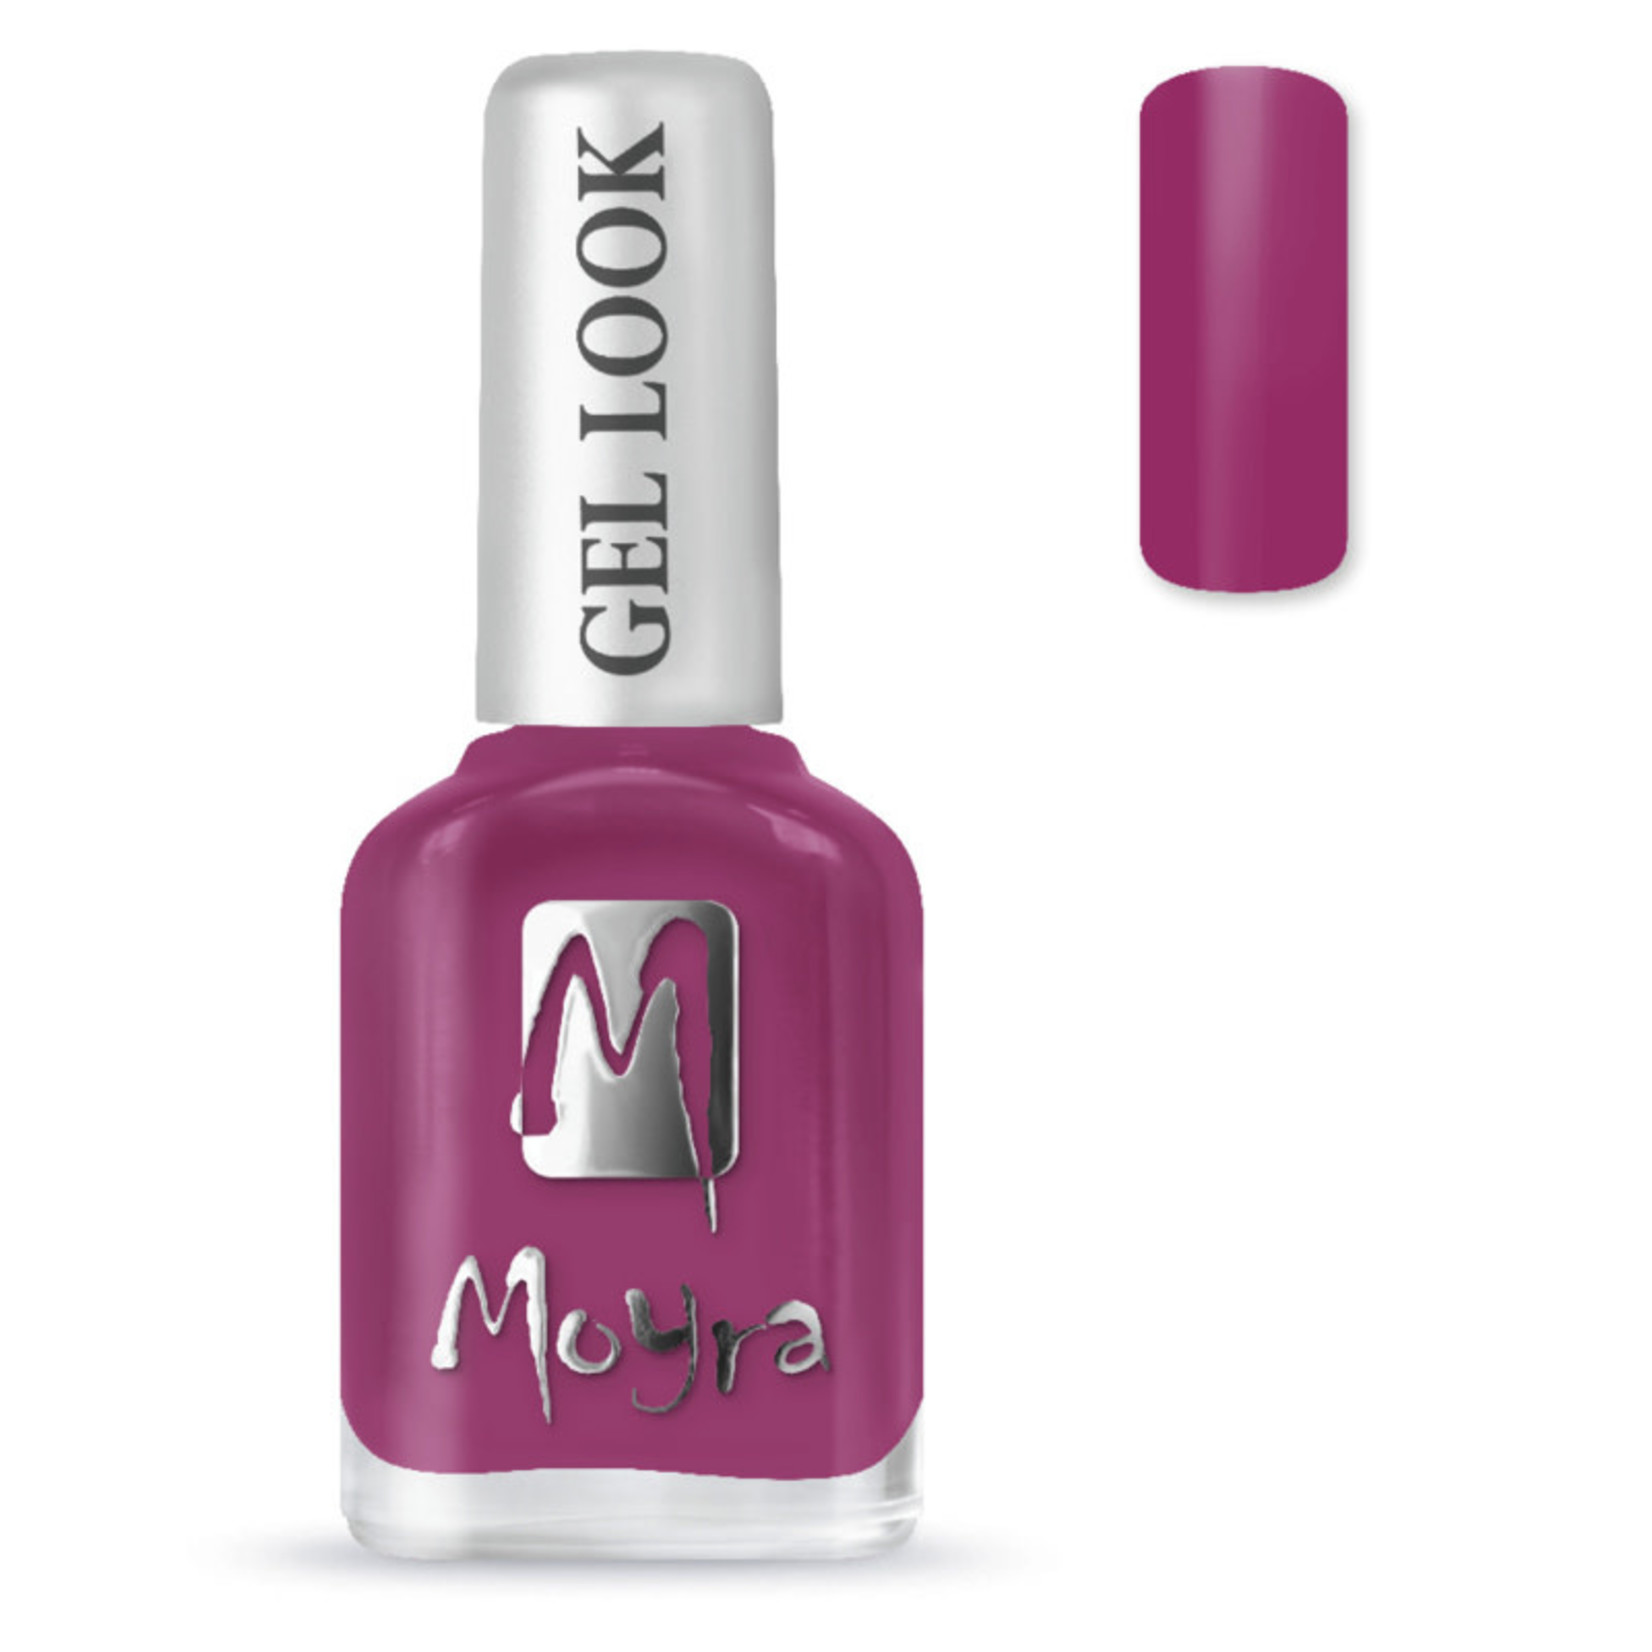 Moyra Moyra Gel Look nail polish 920 Veronique